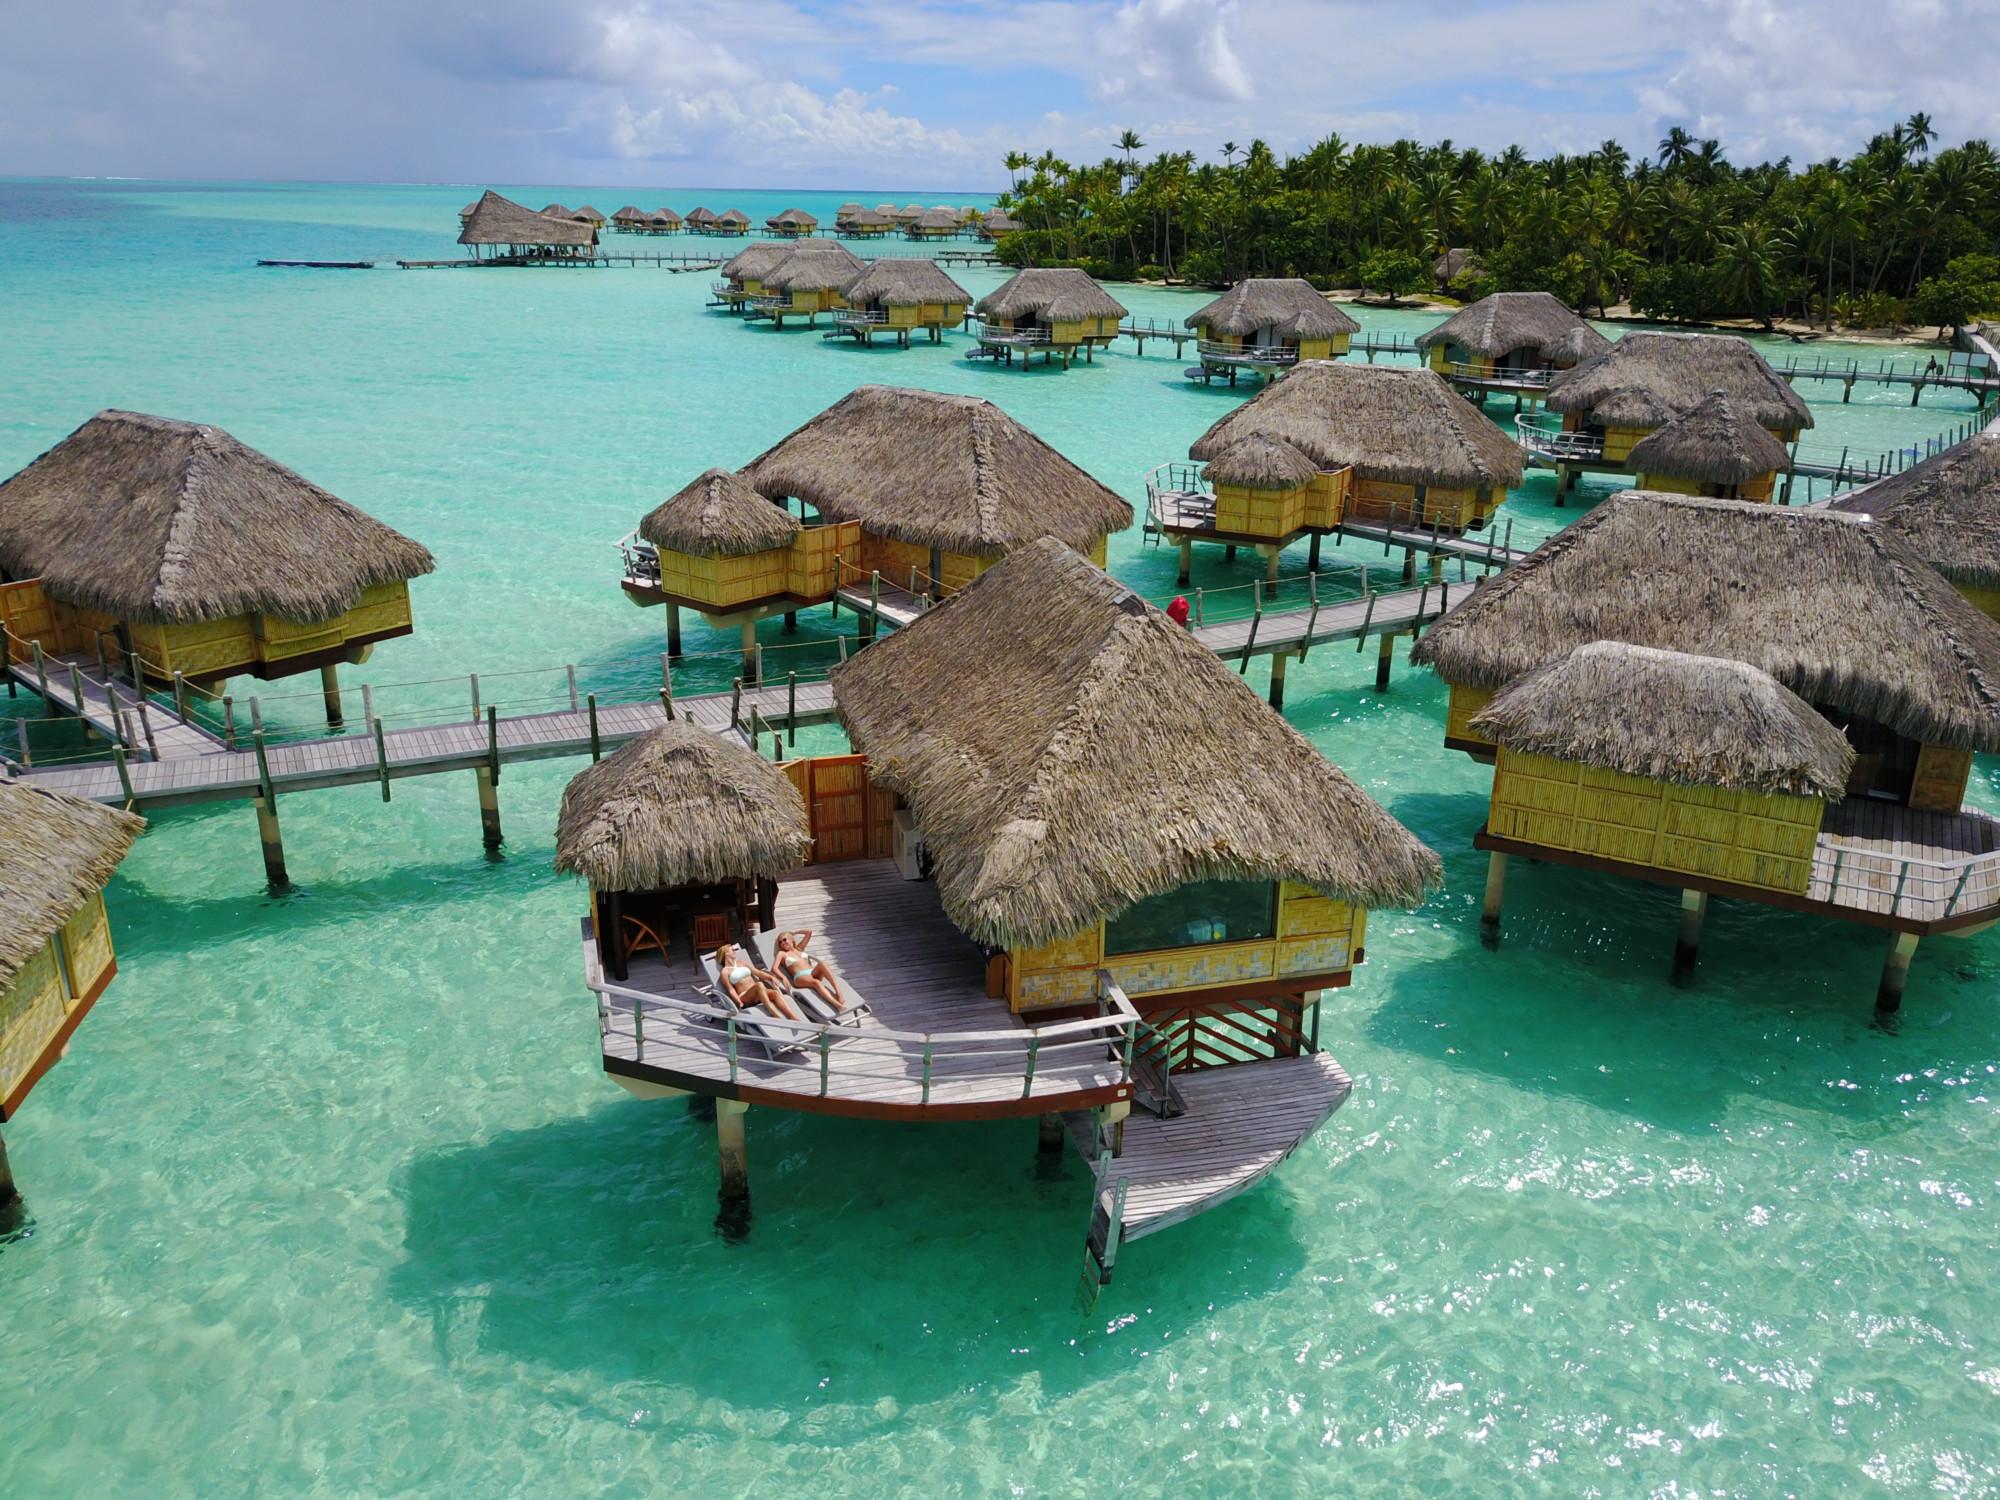 Staying at Le Taha'a Island Resort & Spa